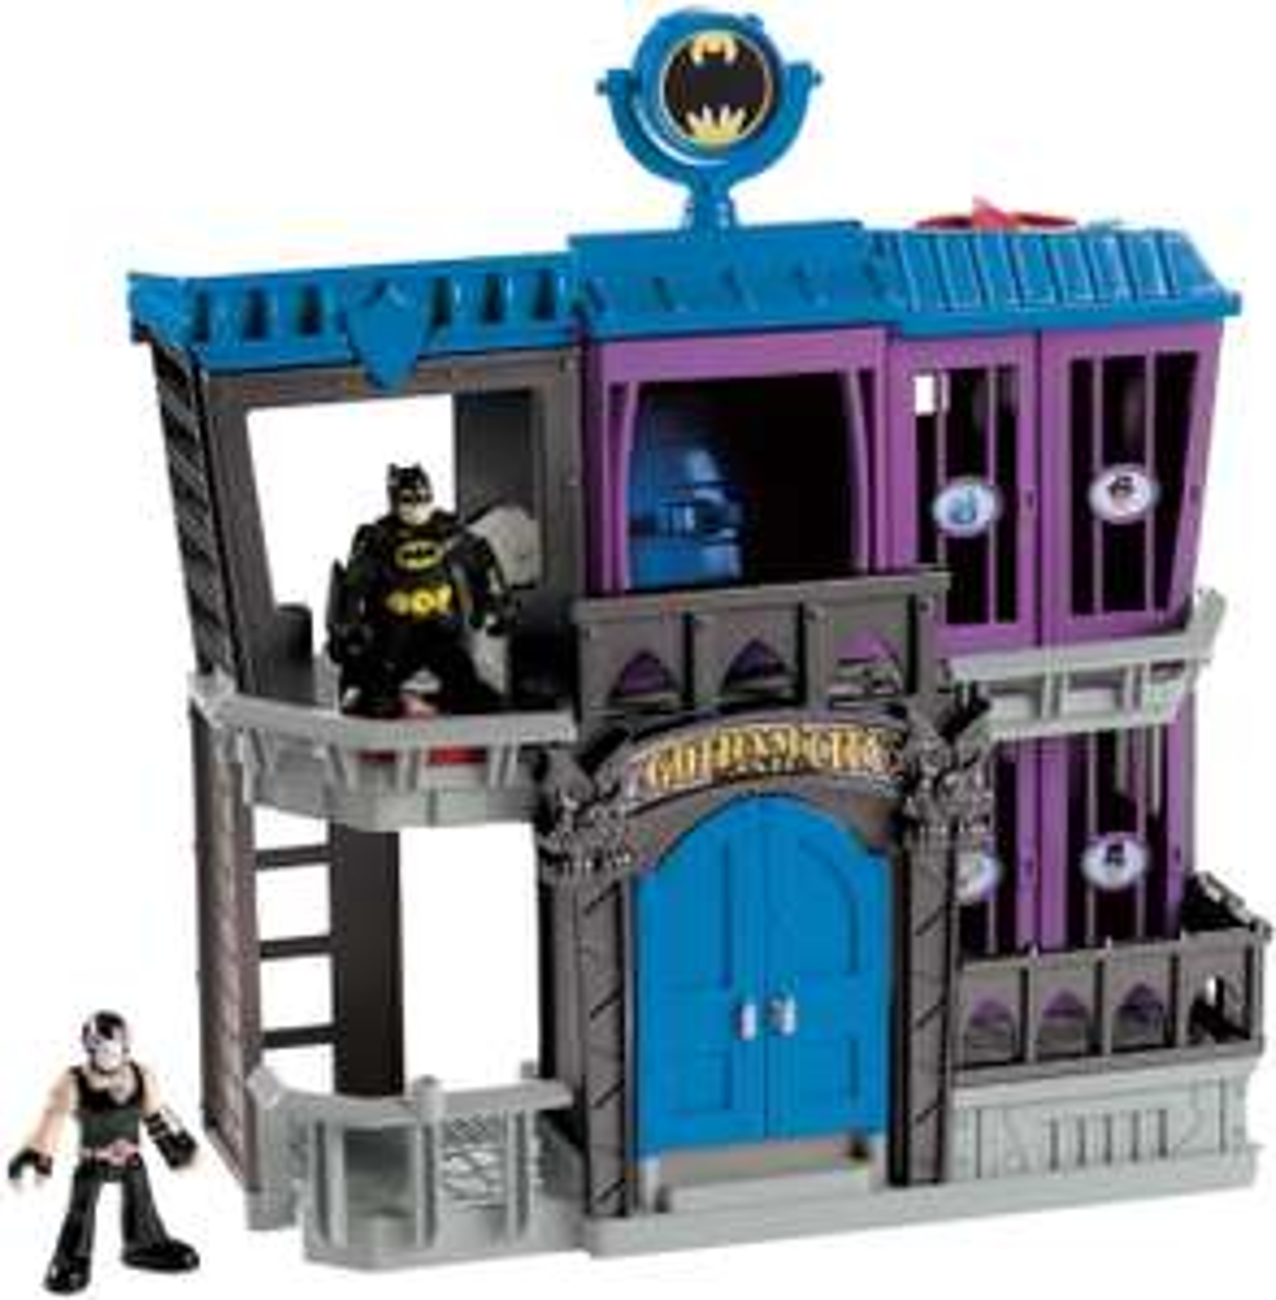 Fisher Price Imaginext DC Super Friends Gotham City Jail + Bane & Batman figures £26.99 delivered @ Bargain Max